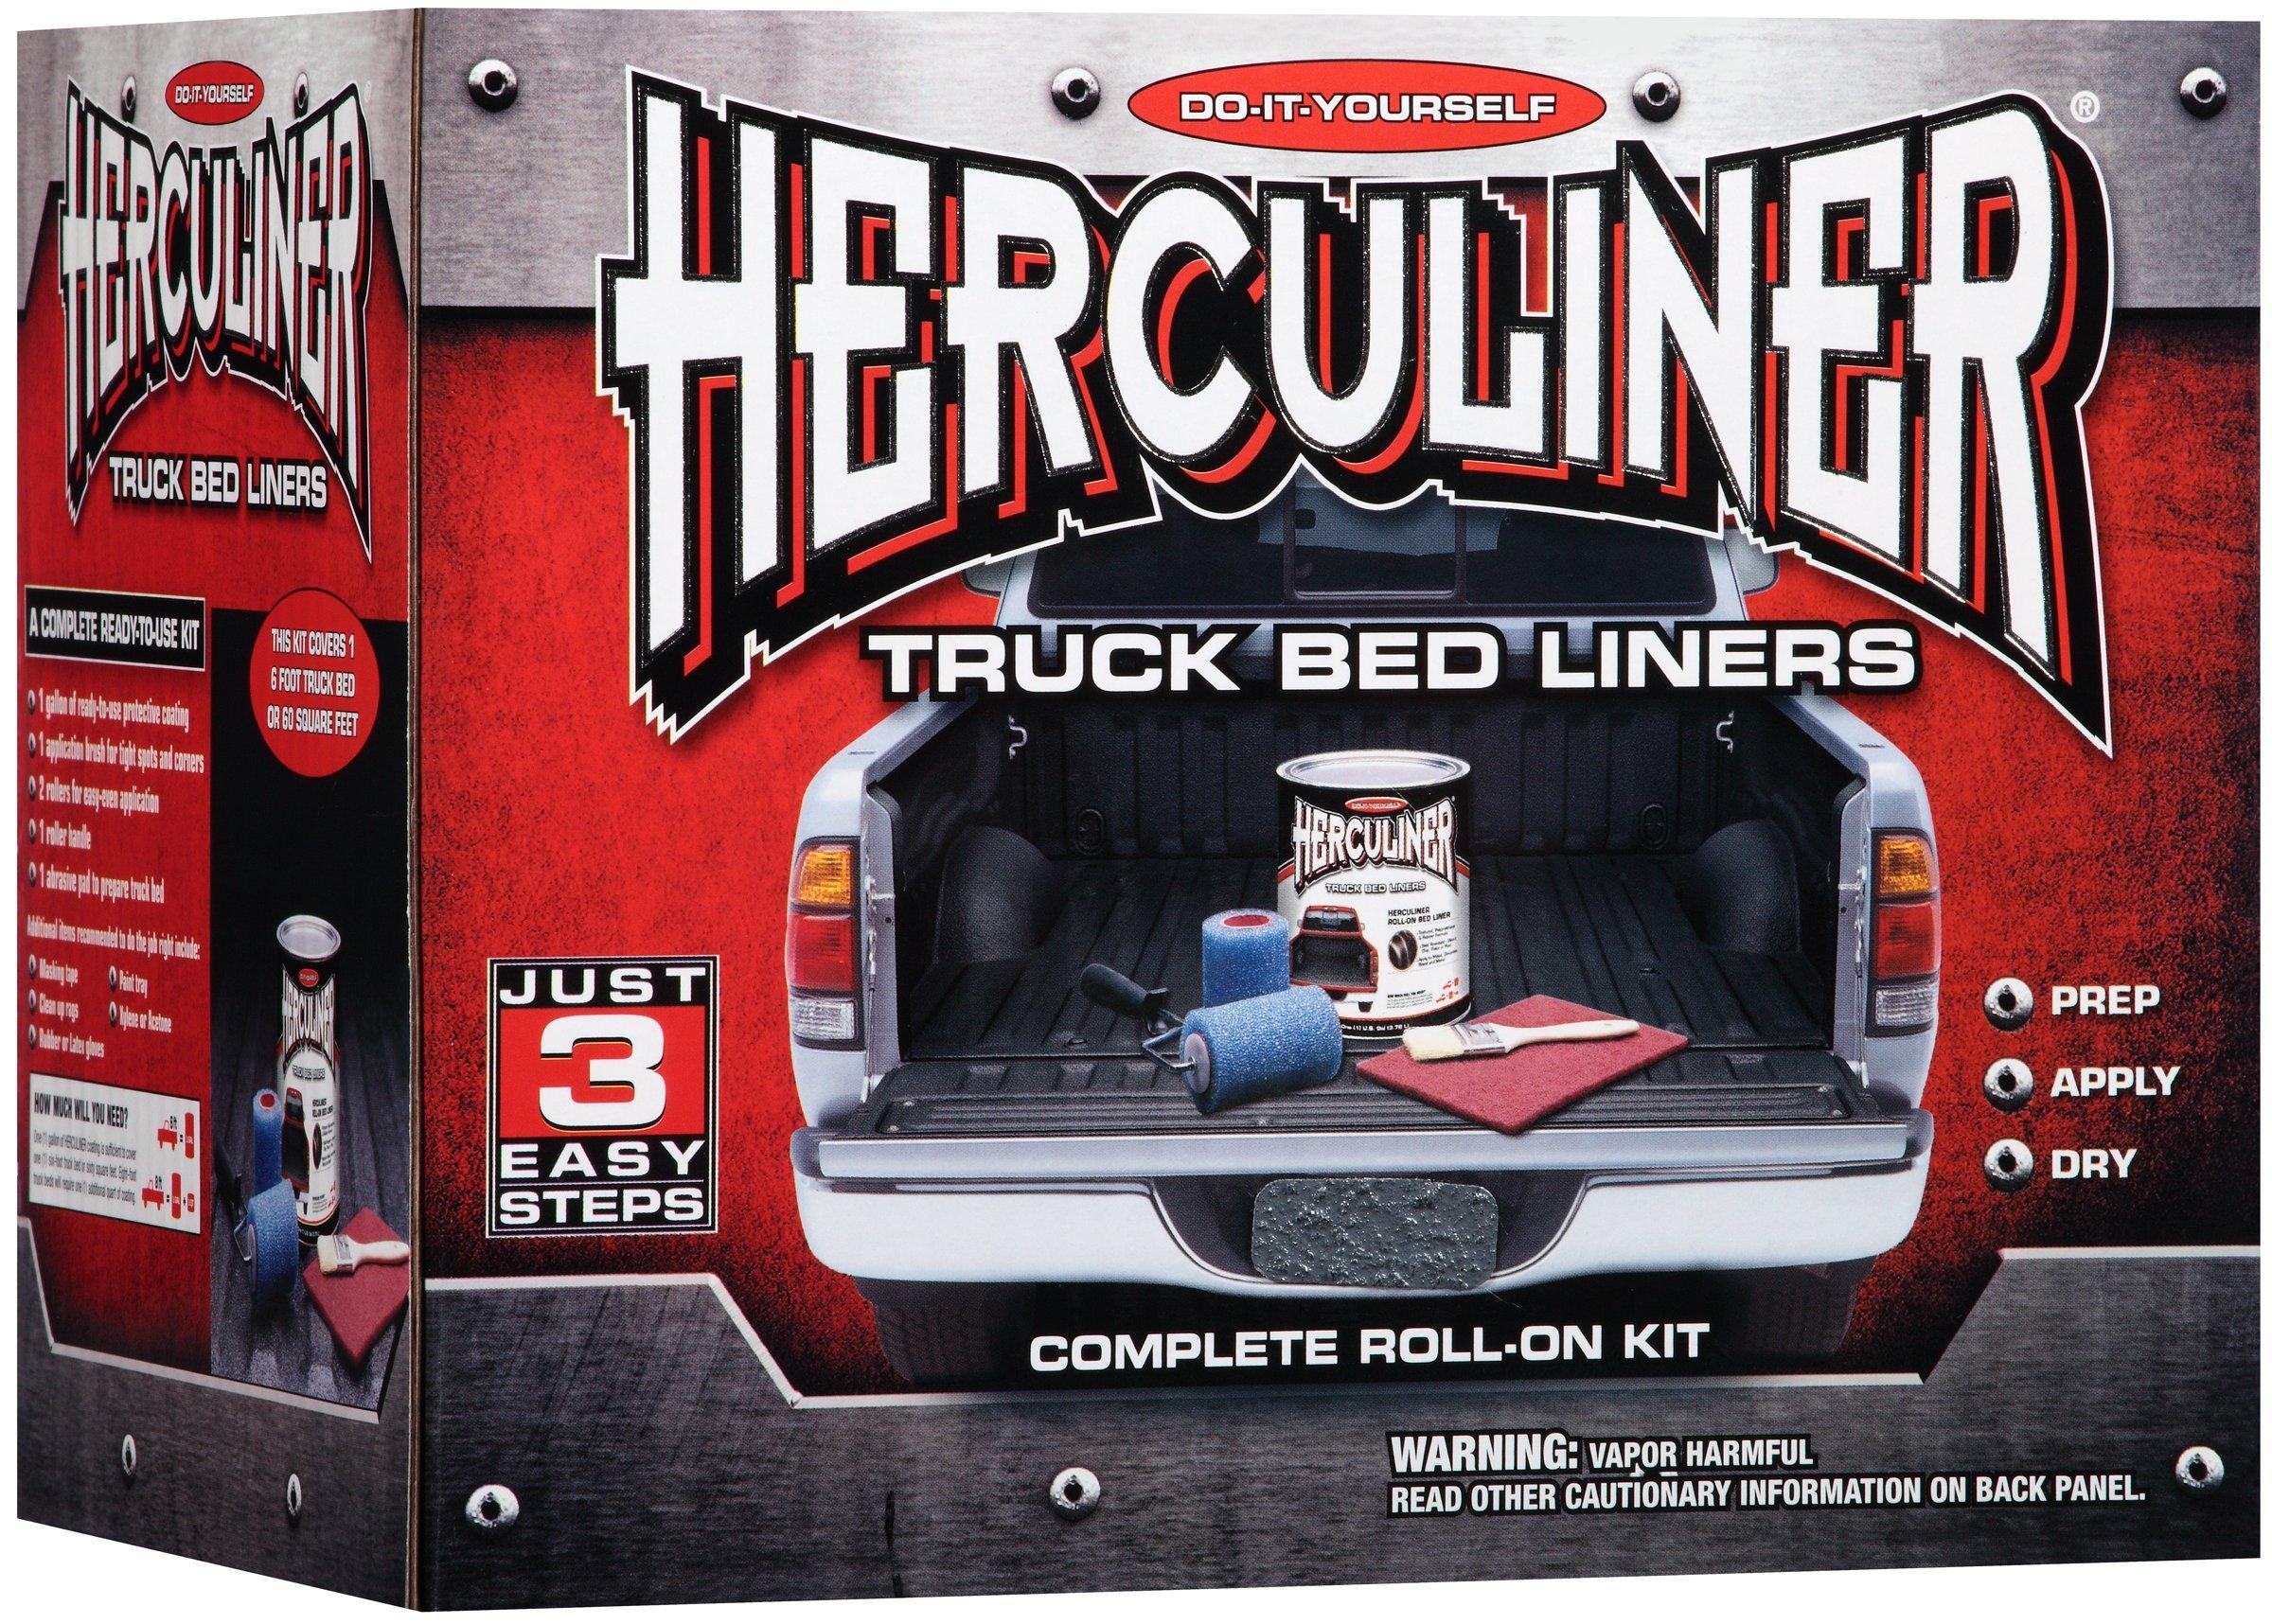 HERCULINER Black 6 foot Truck Bed Roll on Bedliner Kit